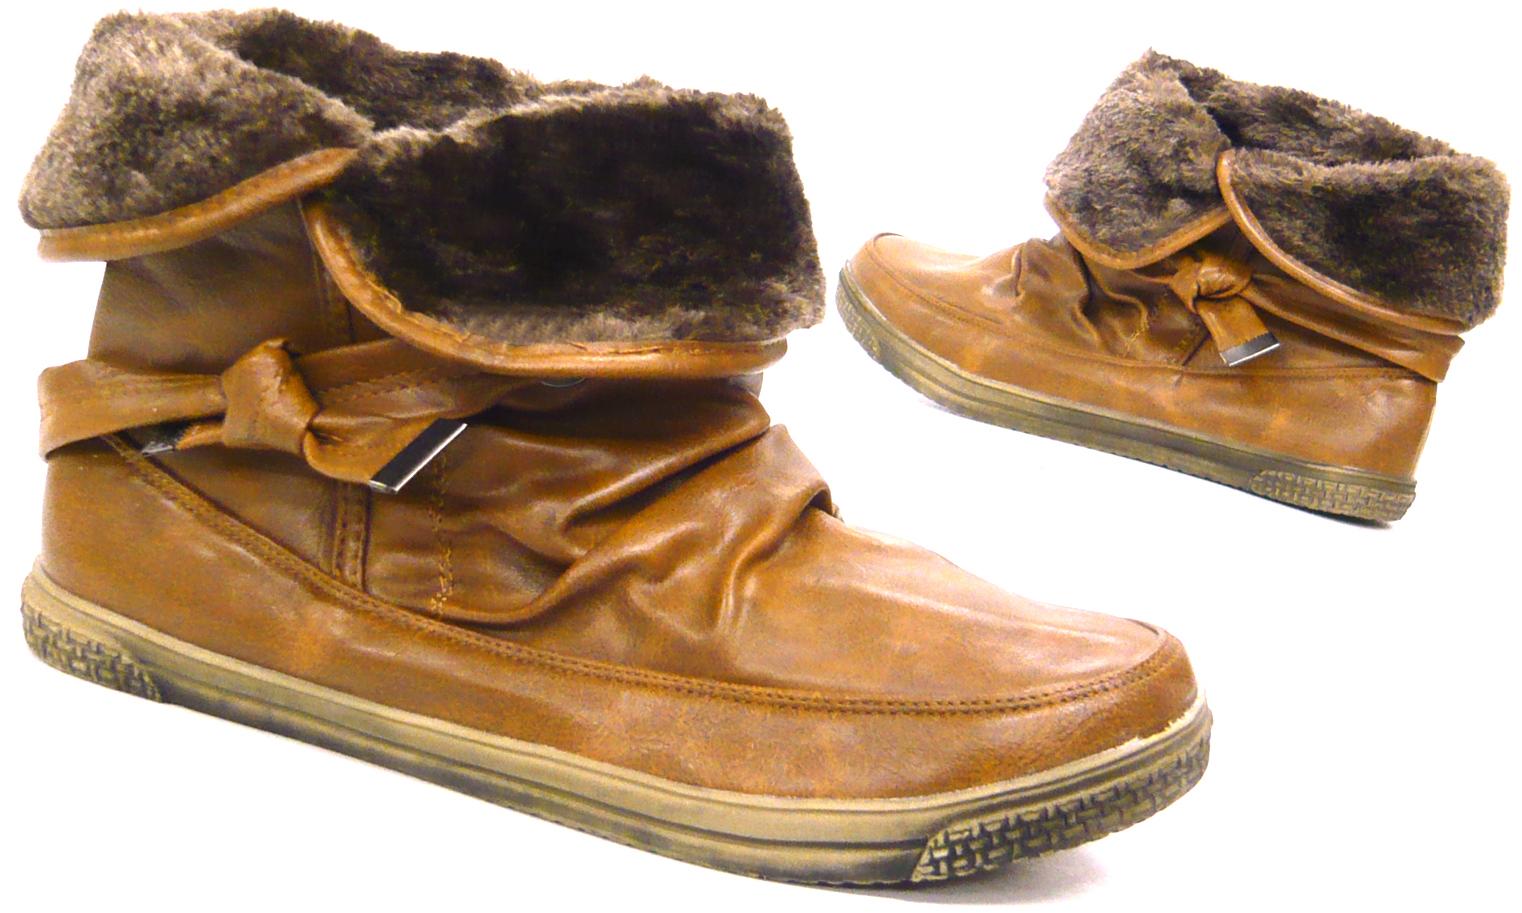 damen schuhe sneaker mit kunst fell rand winter kunst fell. Black Bedroom Furniture Sets. Home Design Ideas